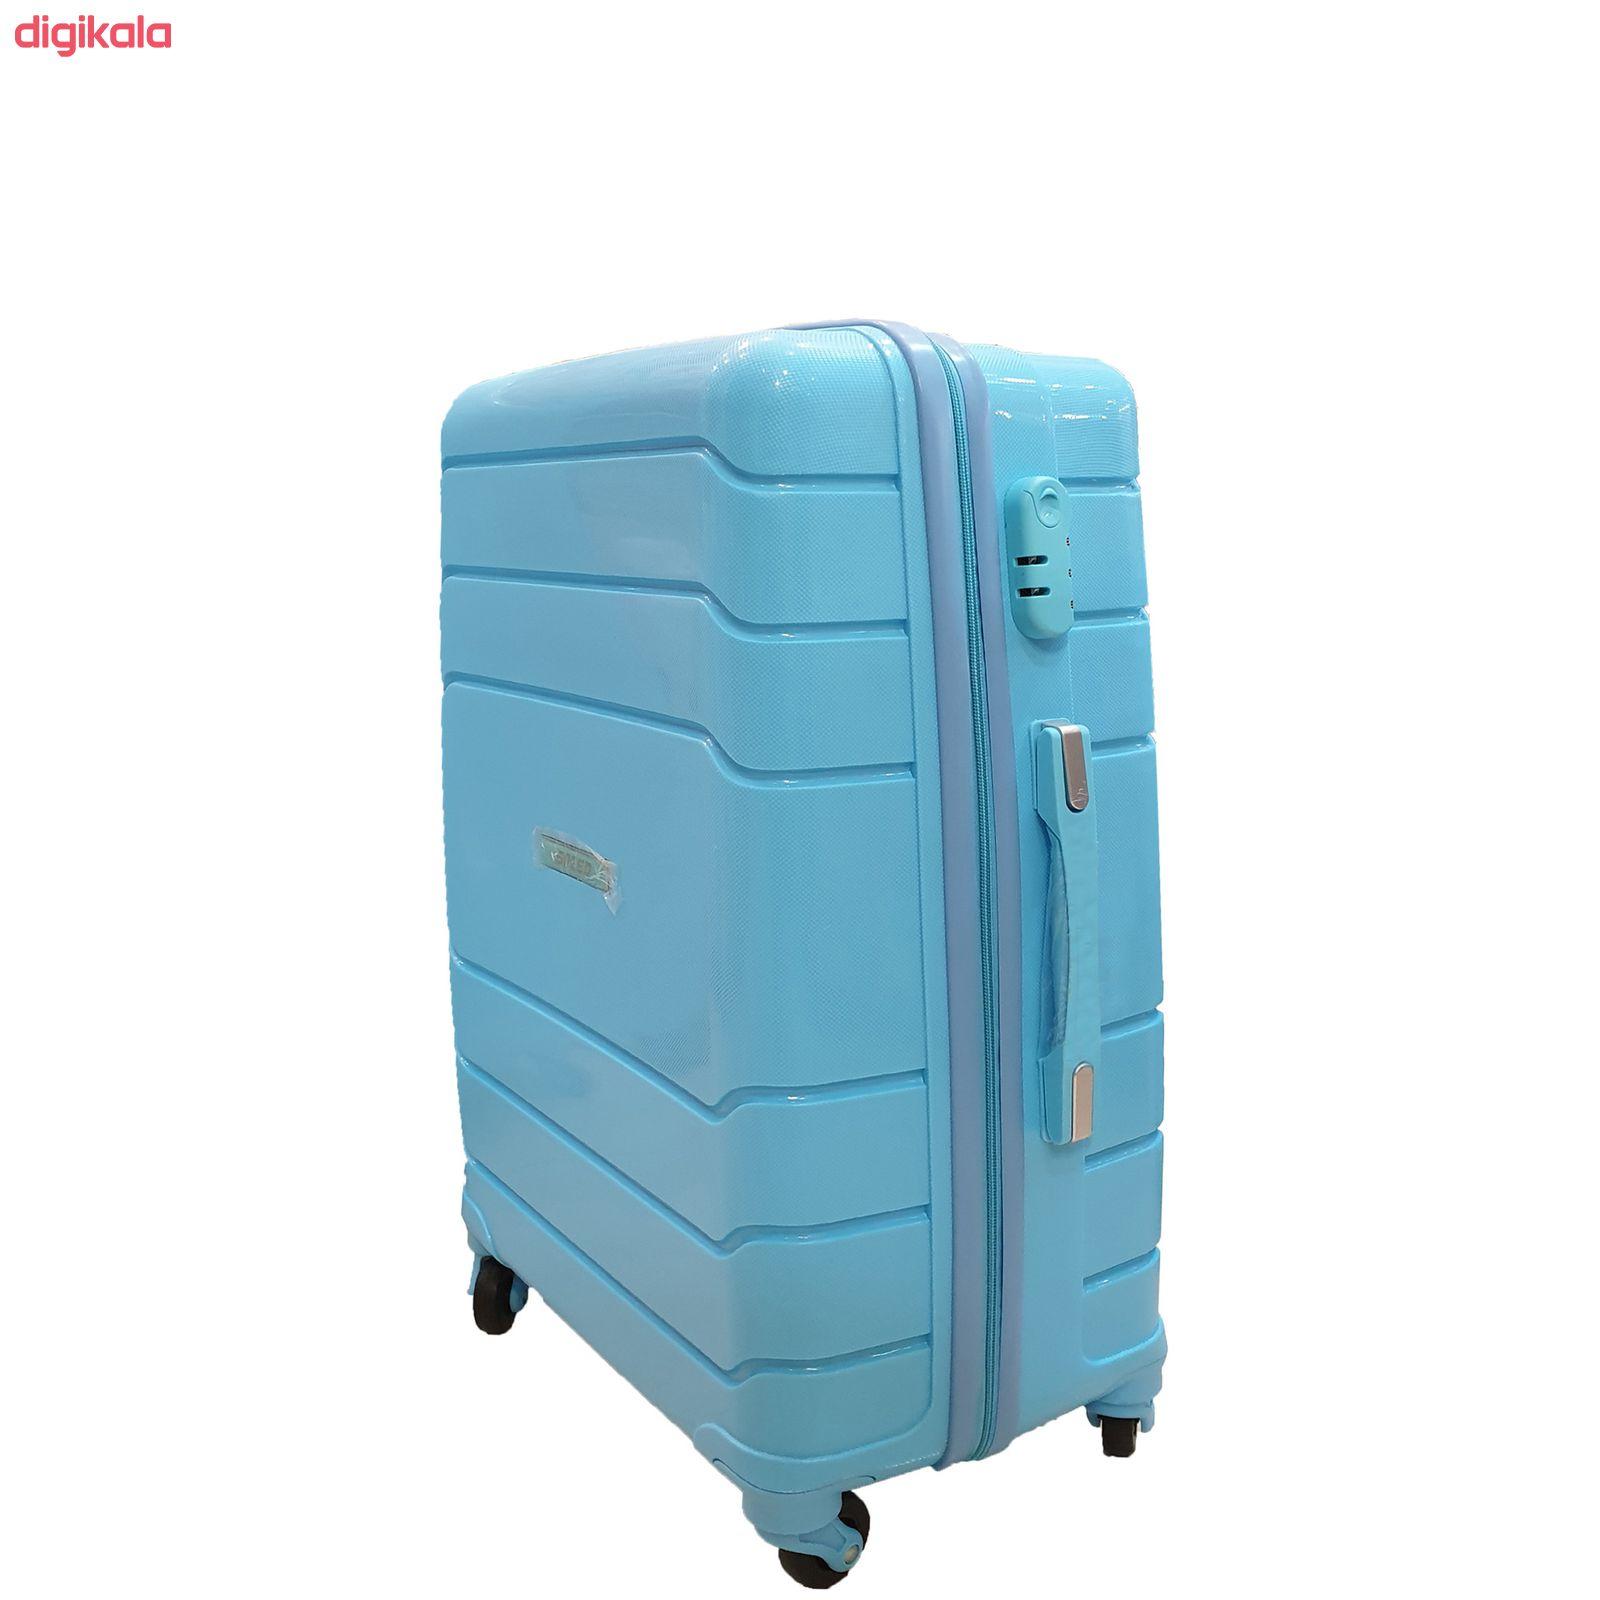 مجموعه سه عددی چمدان اسپید کد B016 main 1 5